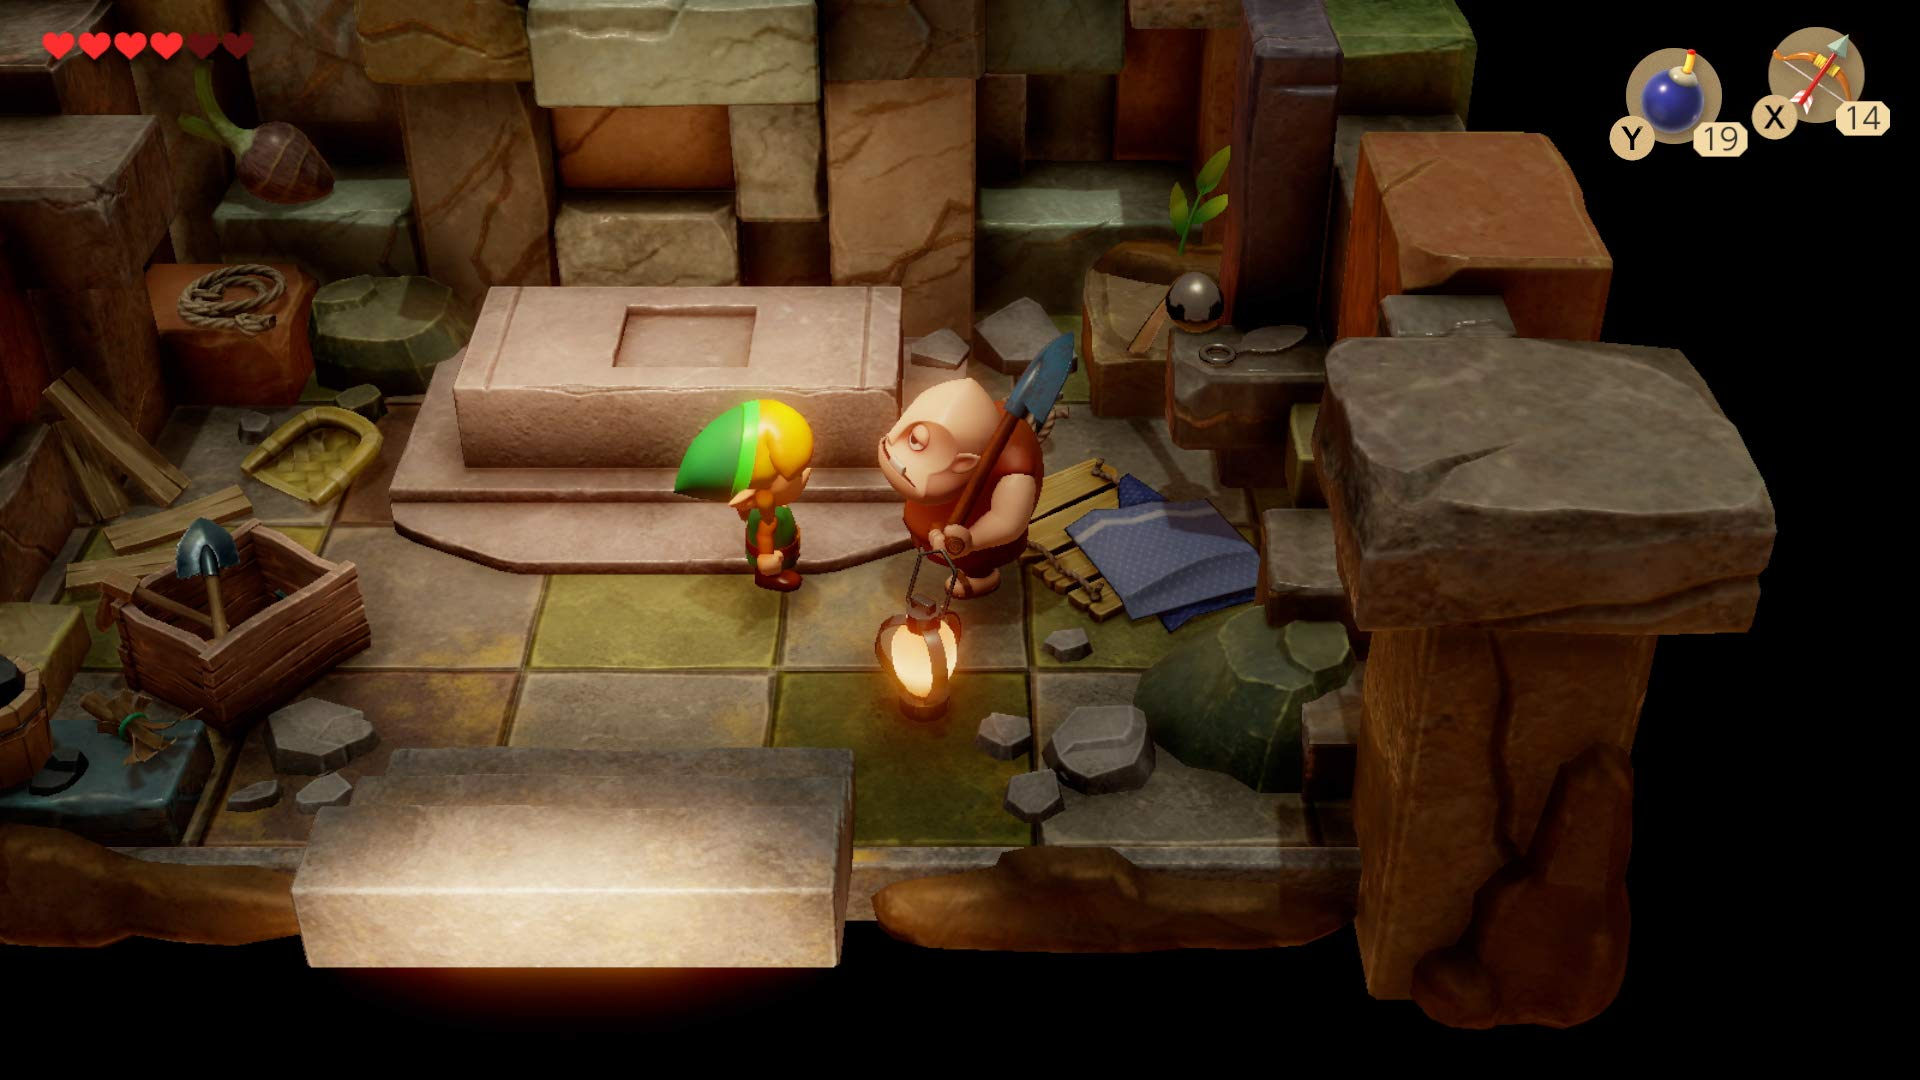 Legend of Zelda Link's Awakening - Nintendo Switch by Nintendo (Image #15)